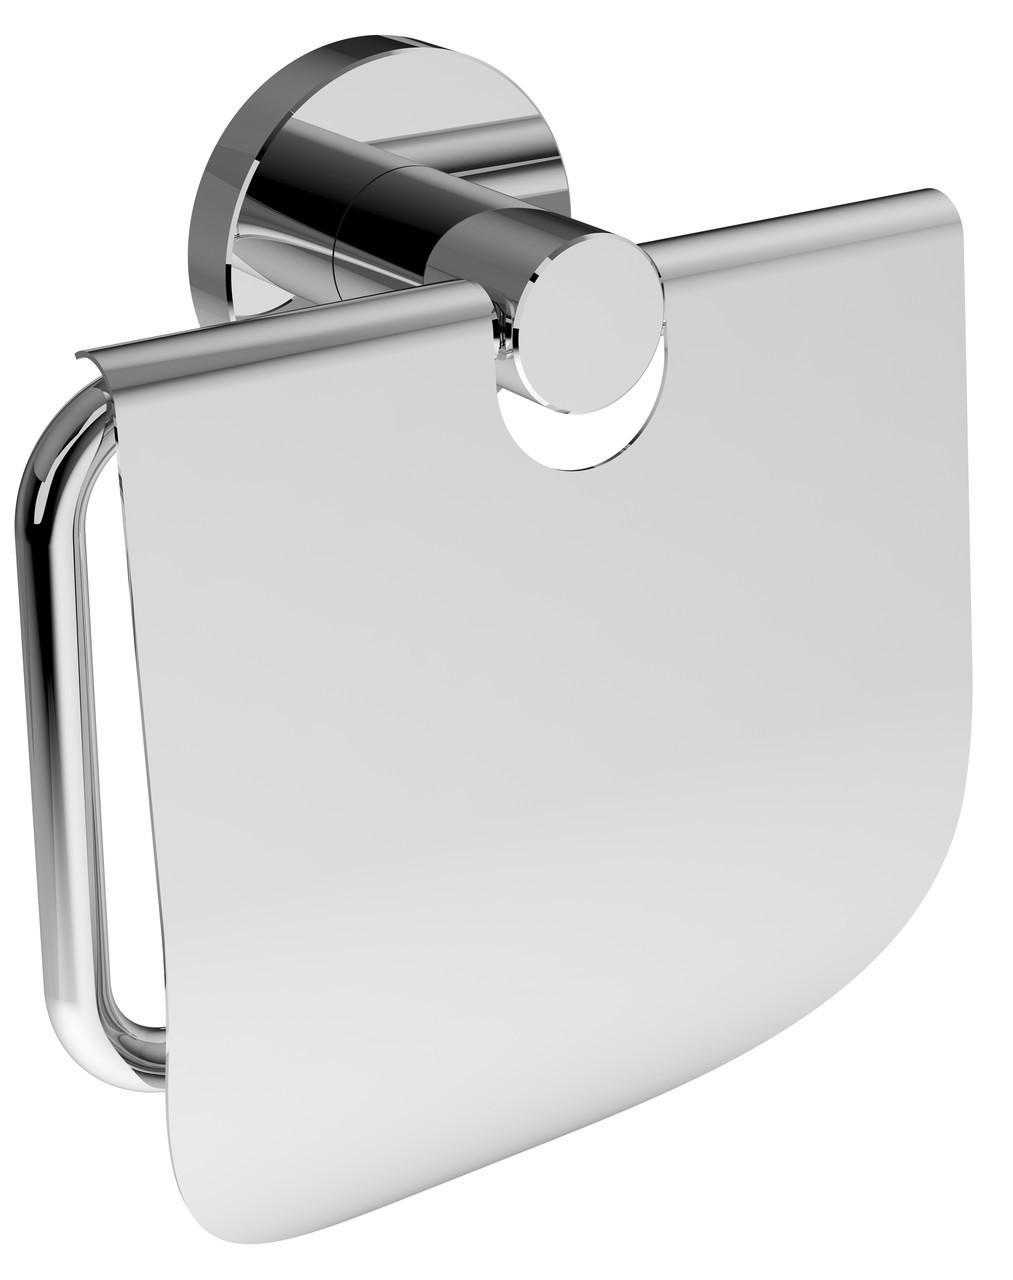 Тримач для туалетного паперу Imprese Hranice 140100 хром